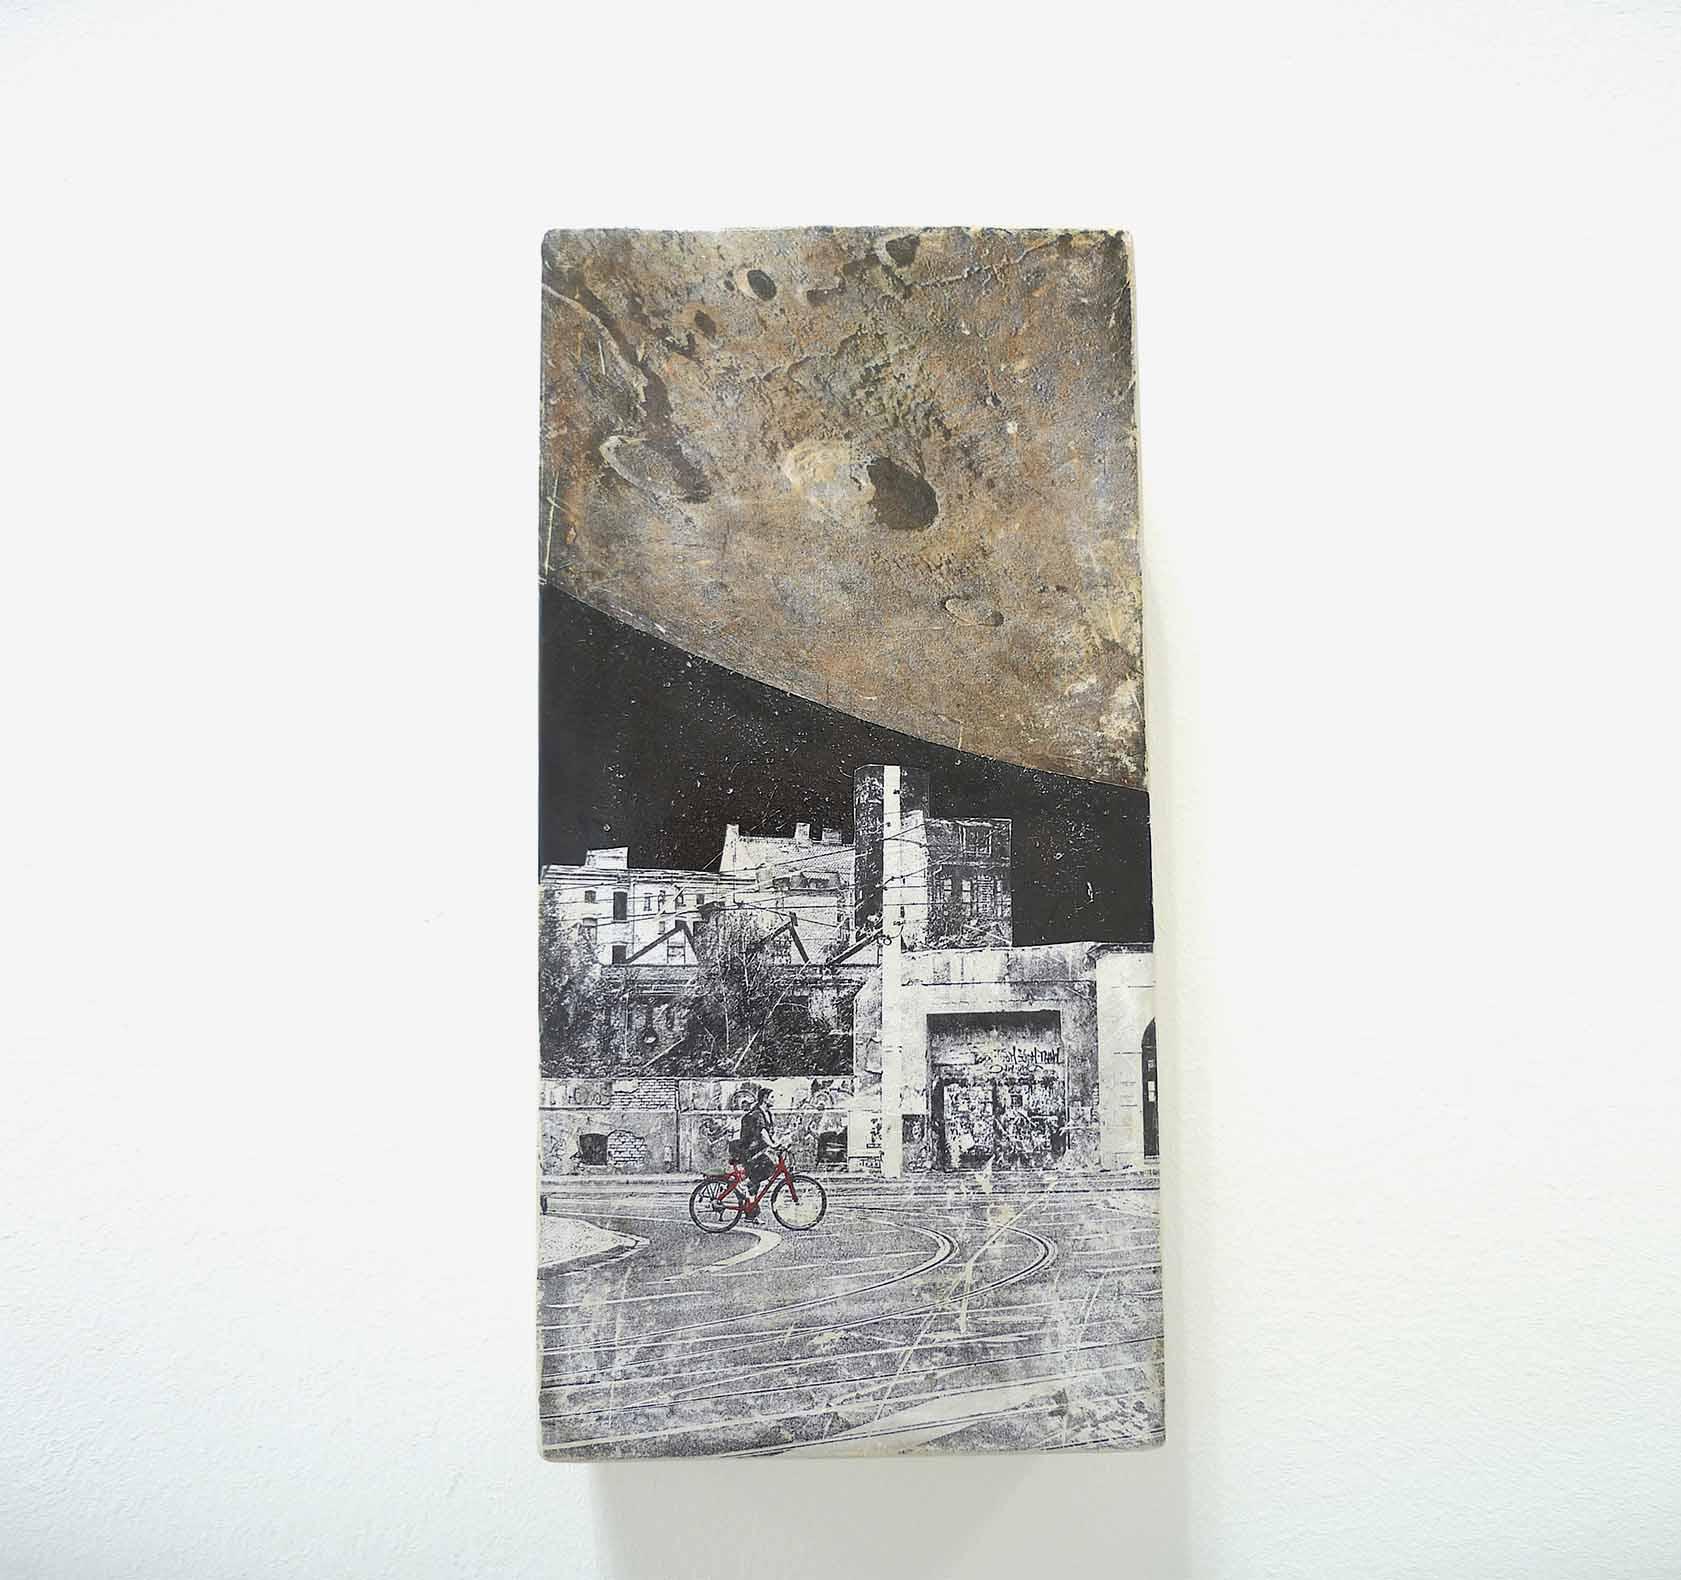 Keramikprint, Nicole Thoss, Südwestdeutscher Keramikpreis